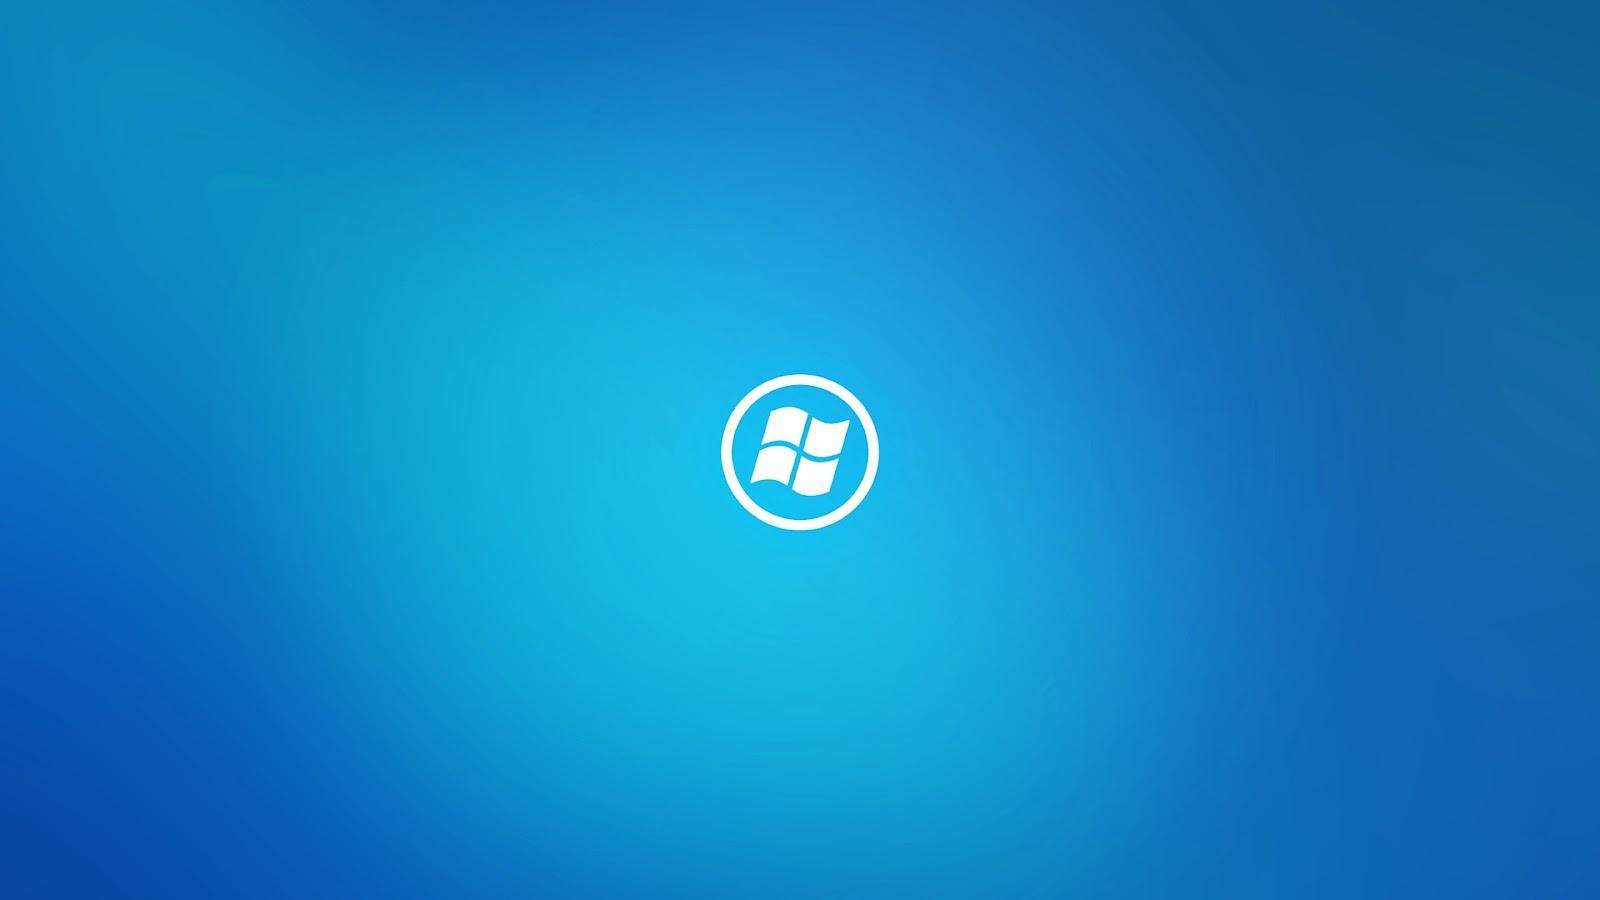 free windows 10 wallpapers windows 10 wallpapers download windows 1600x900